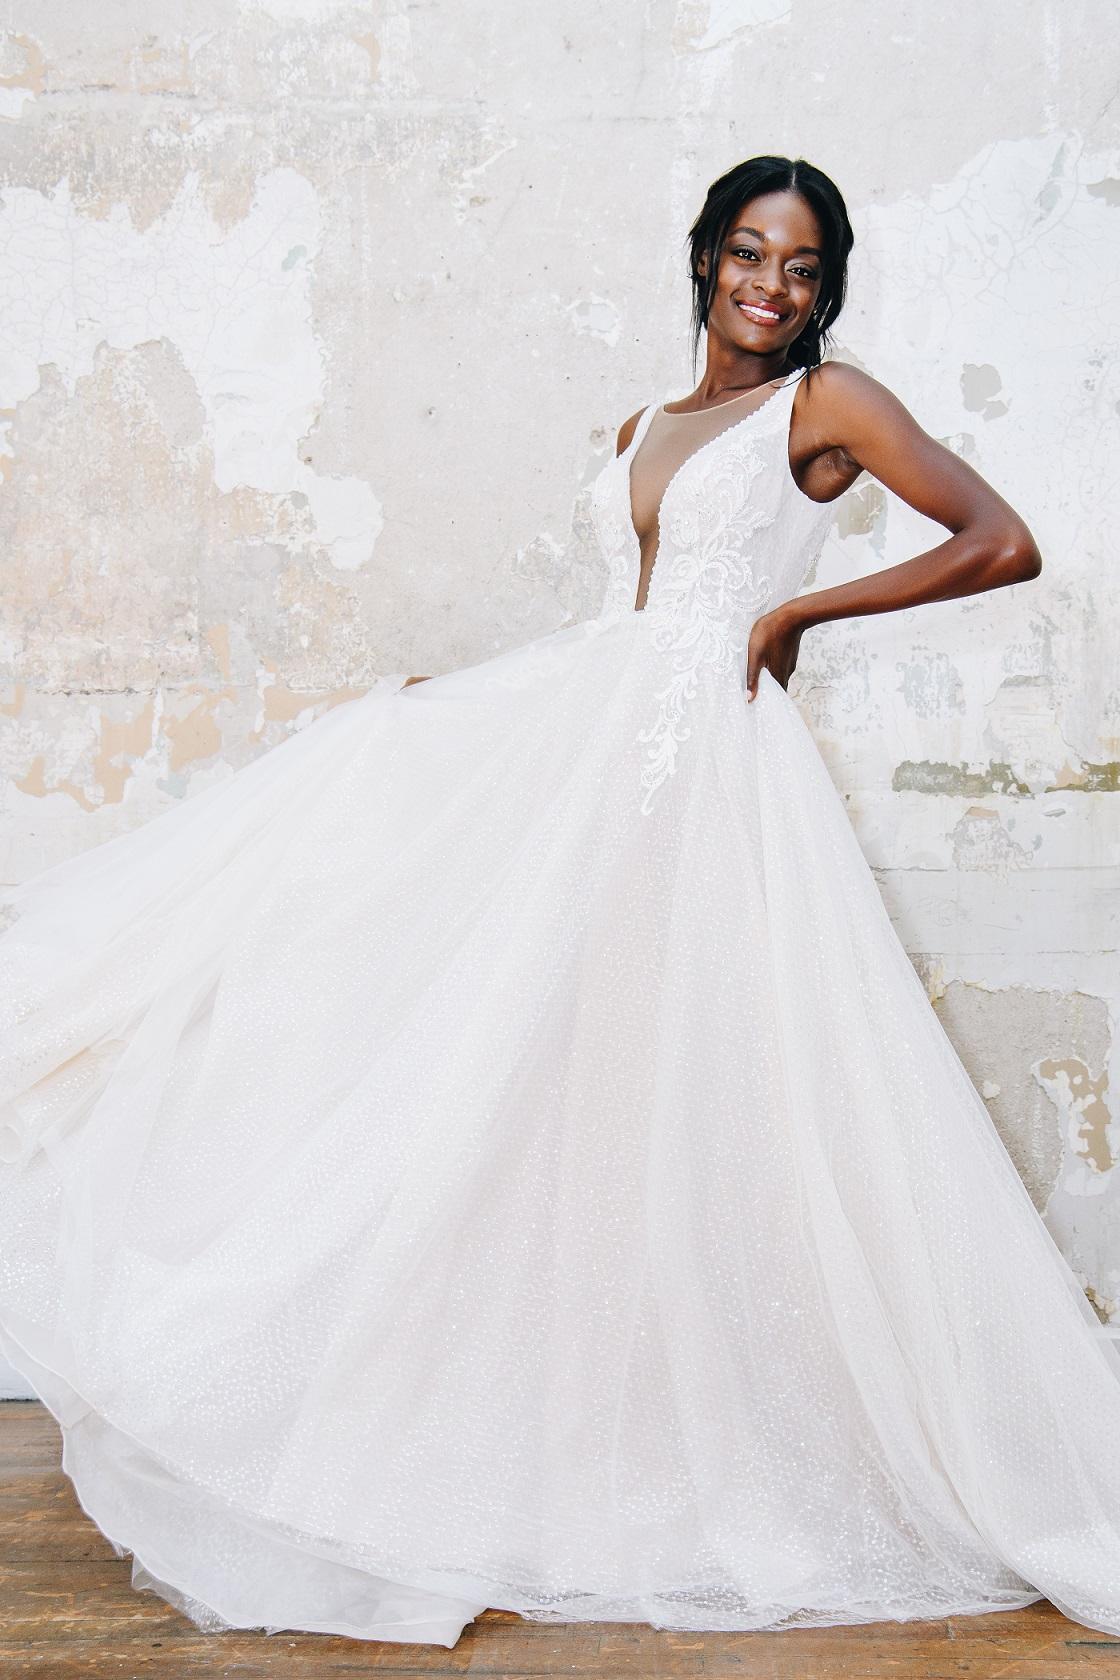 2020 Spring Wedding Dresses David S Bridal Blog A Wedding By Jeff,Wedding Guest Dresses Spring 2020